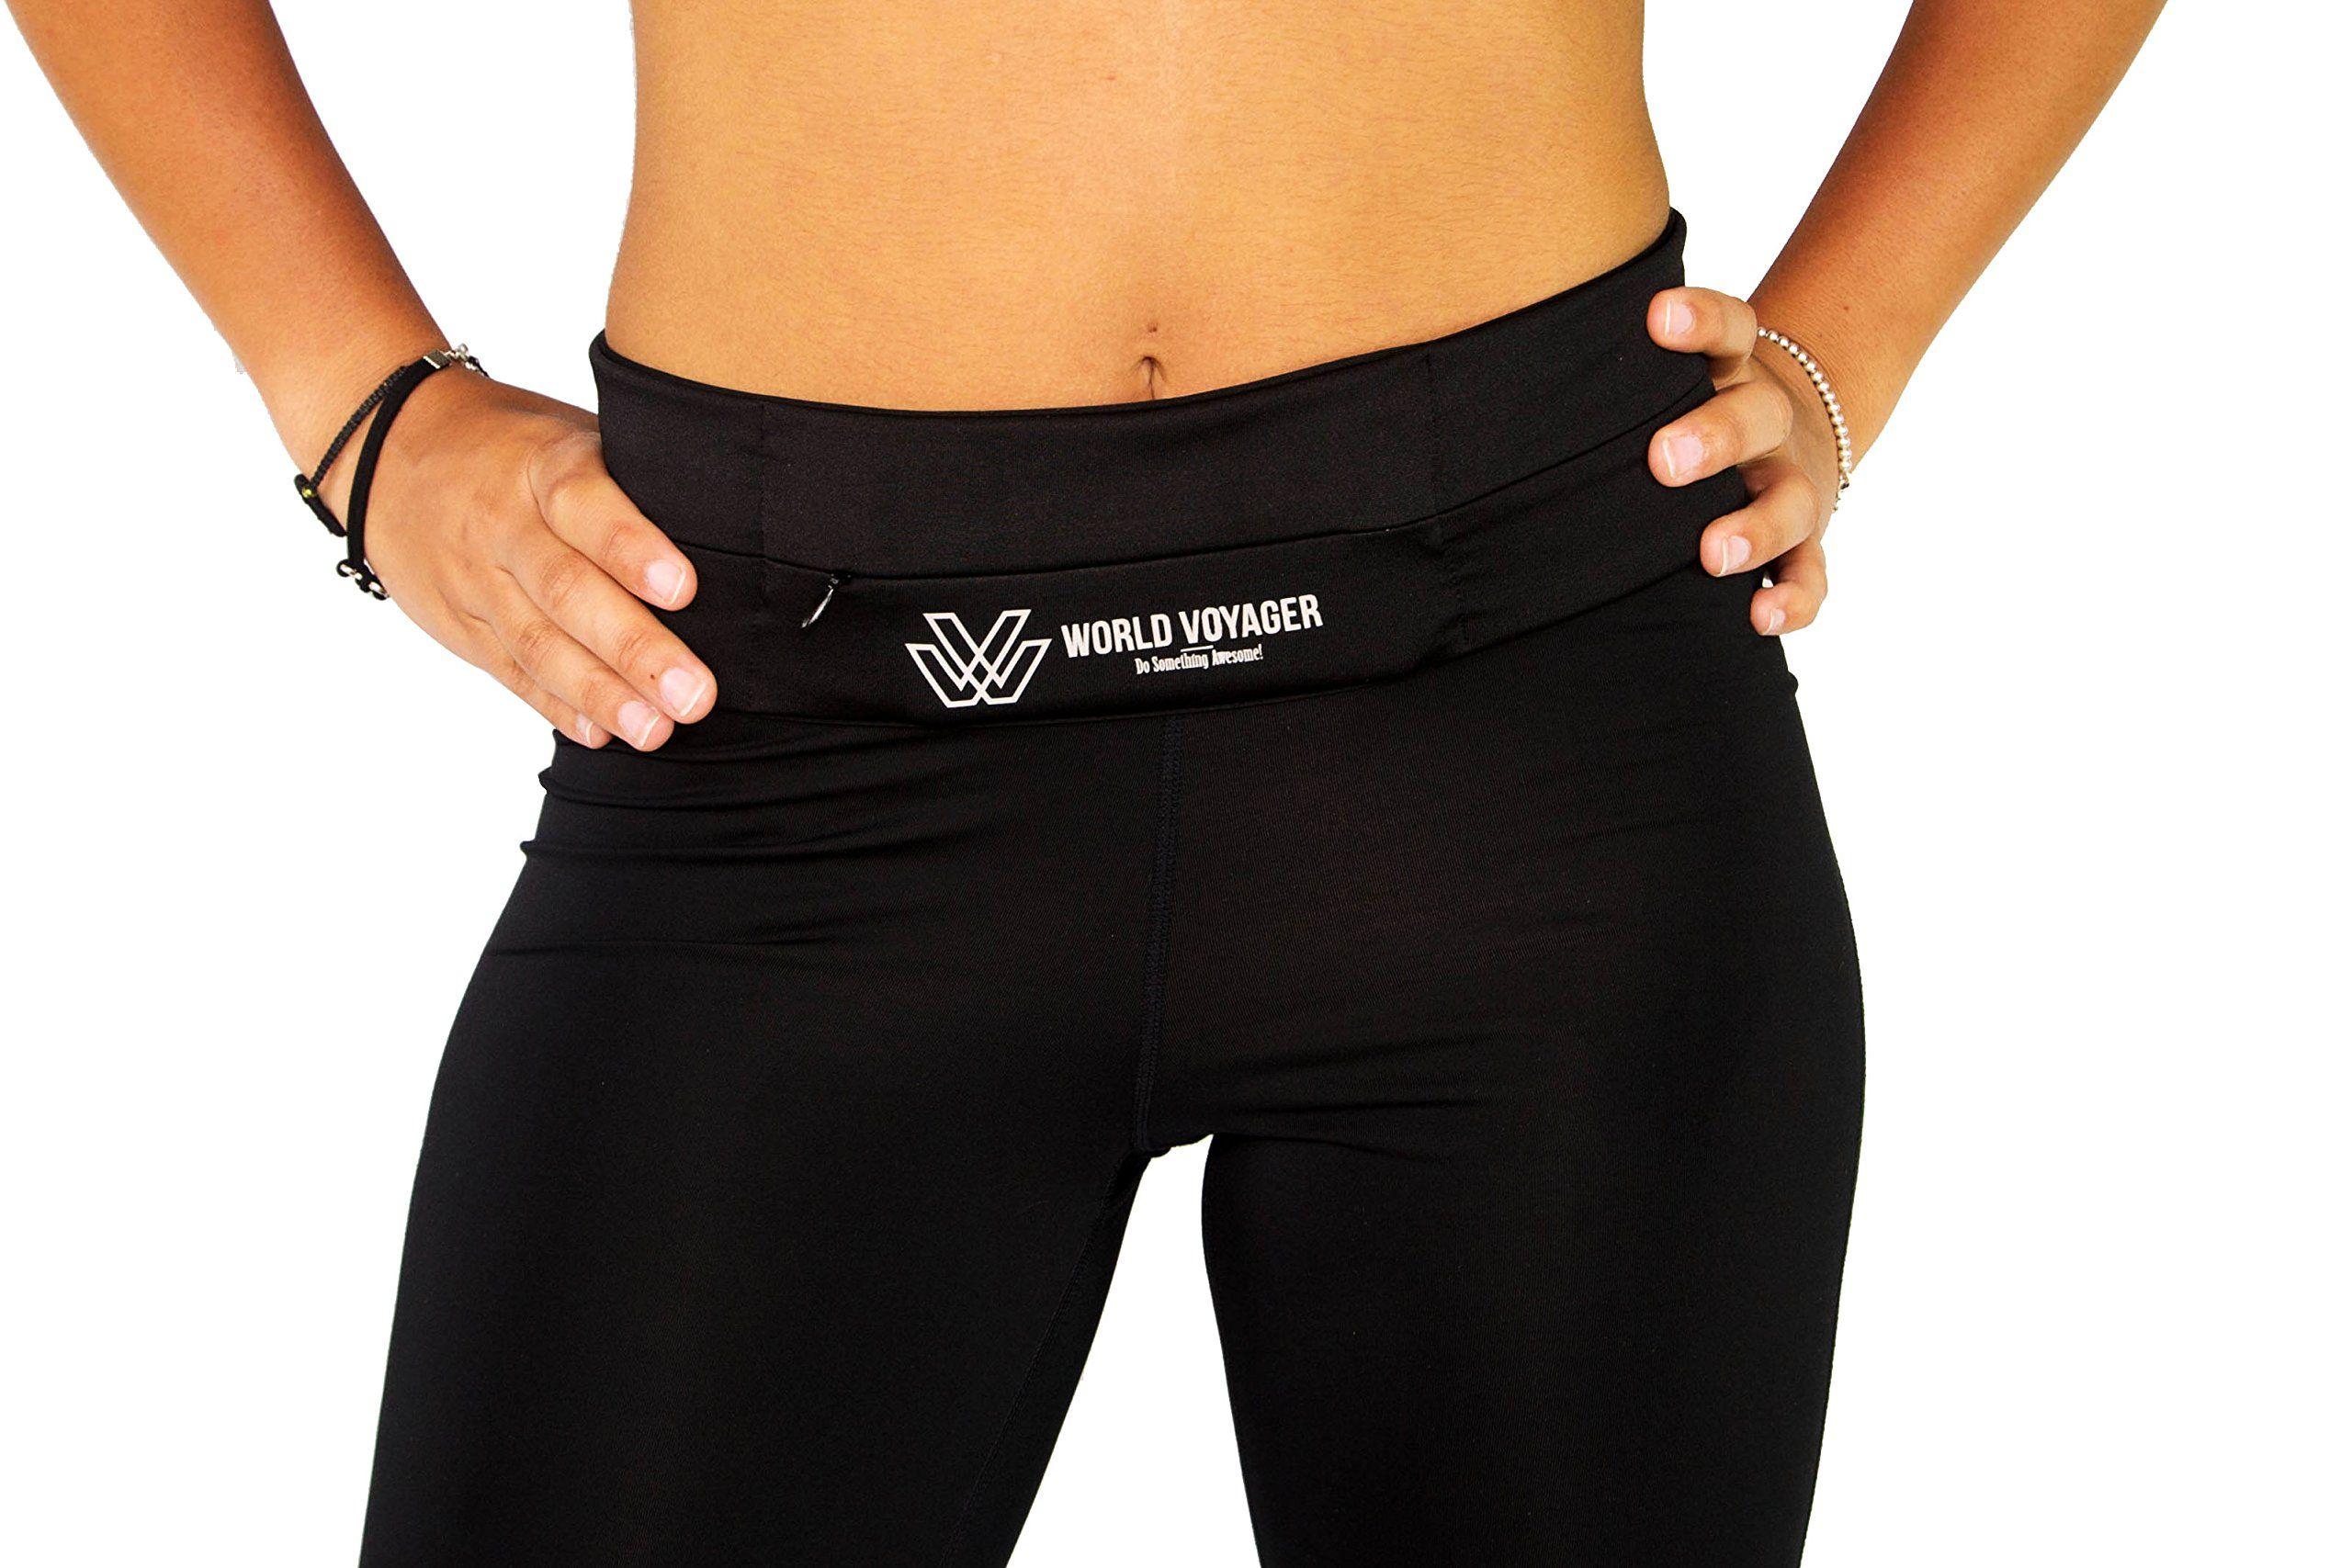 8b114056e770 Premium Quality No Bounce Running Belt & Fitness Waist Pack Unisex ...